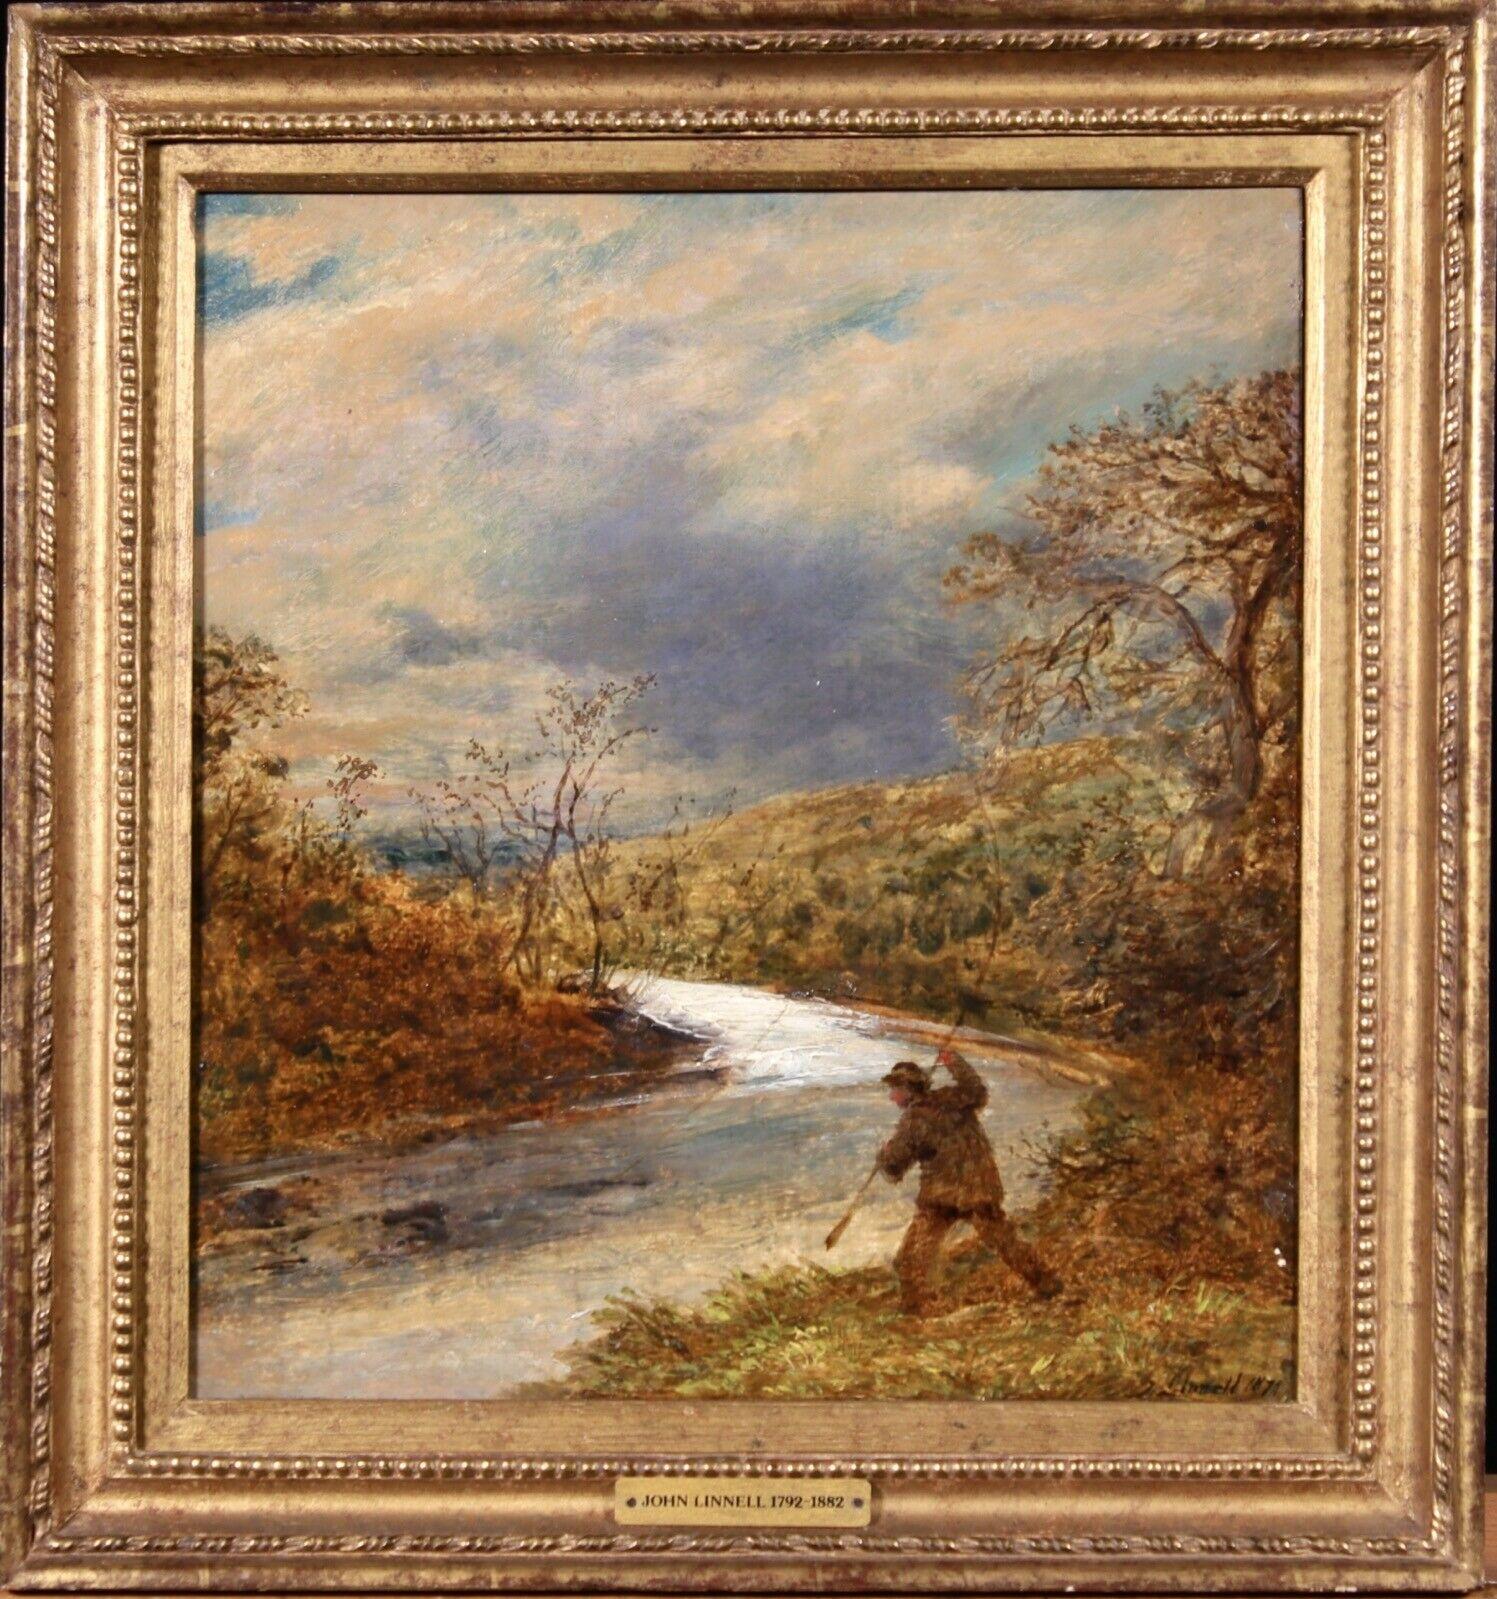 John Linnell (British 1792-1882): The Angler - Image 2 of 2